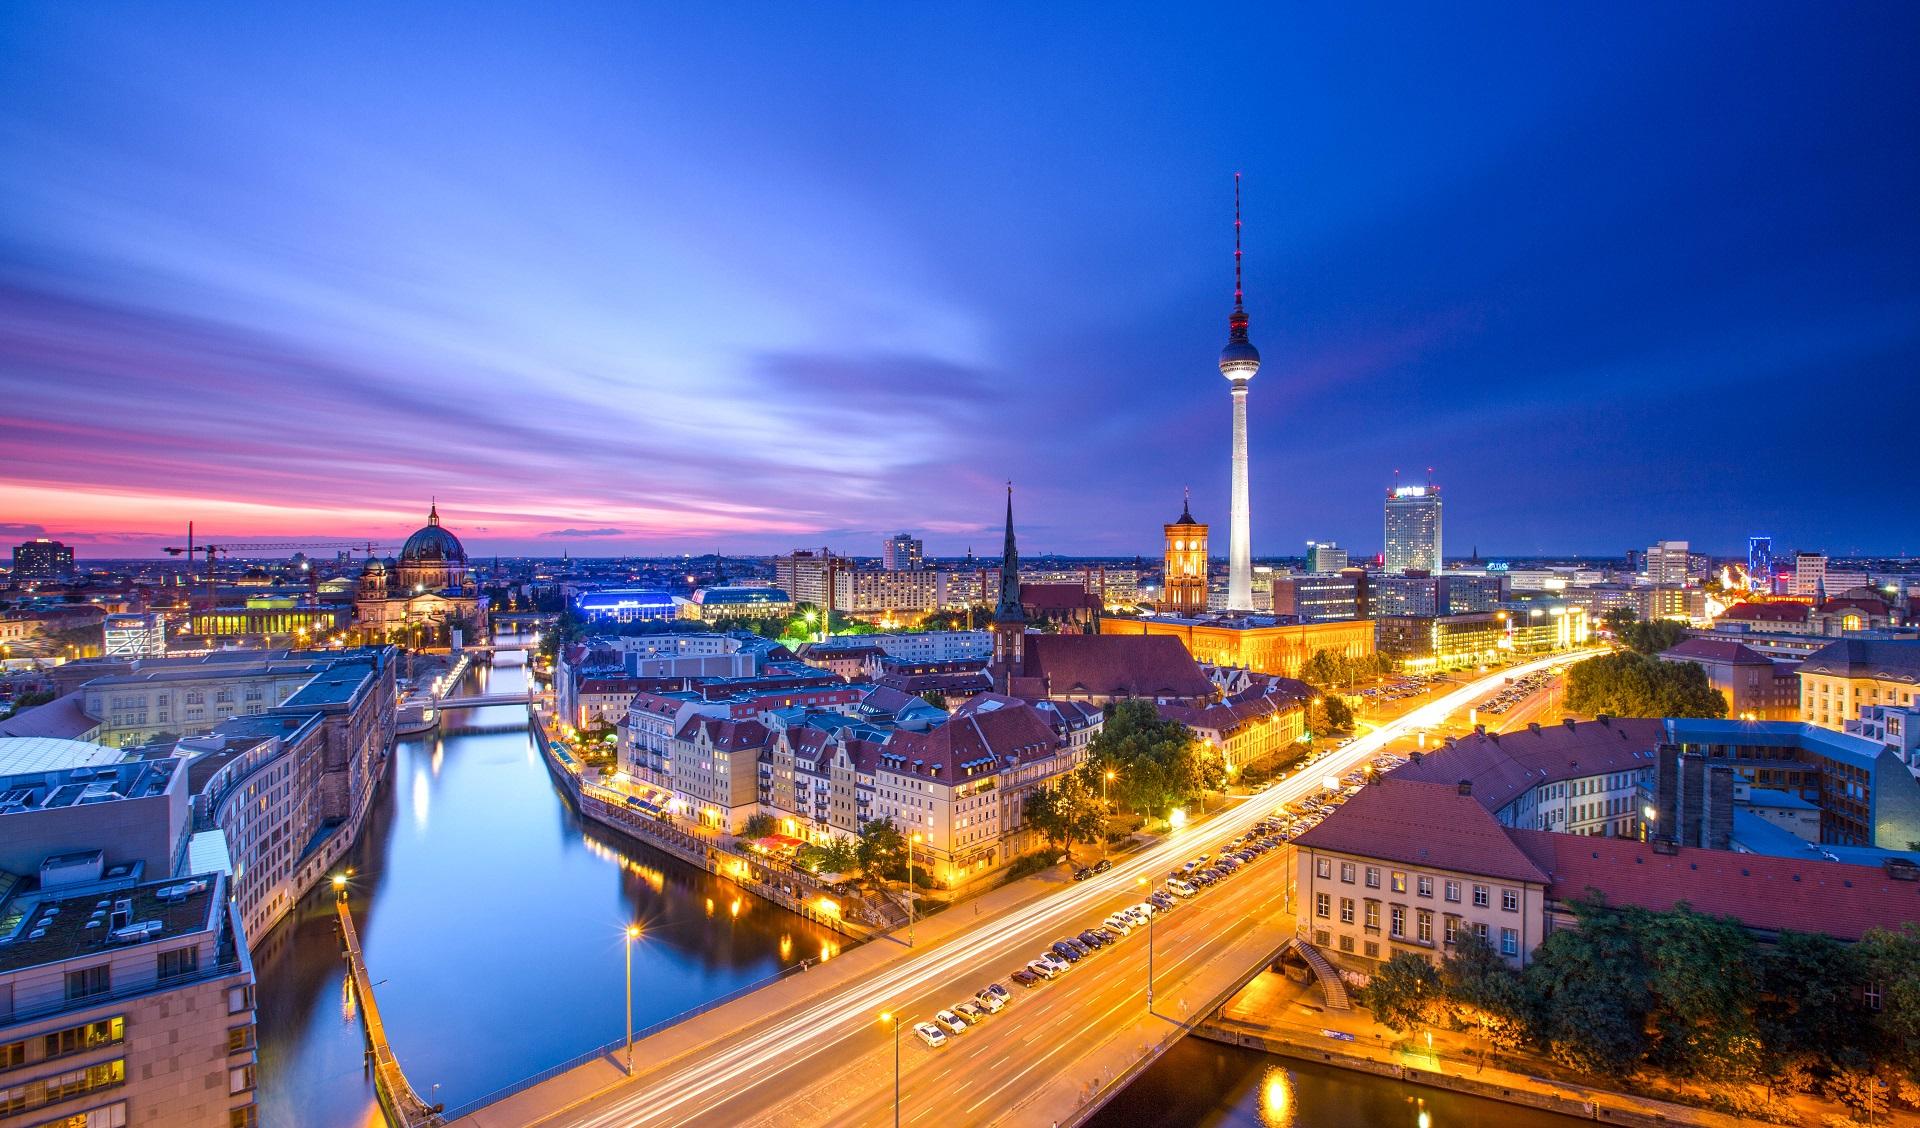 silvester in berlin 2016 17 die party hotspots. Black Bedroom Furniture Sets. Home Design Ideas